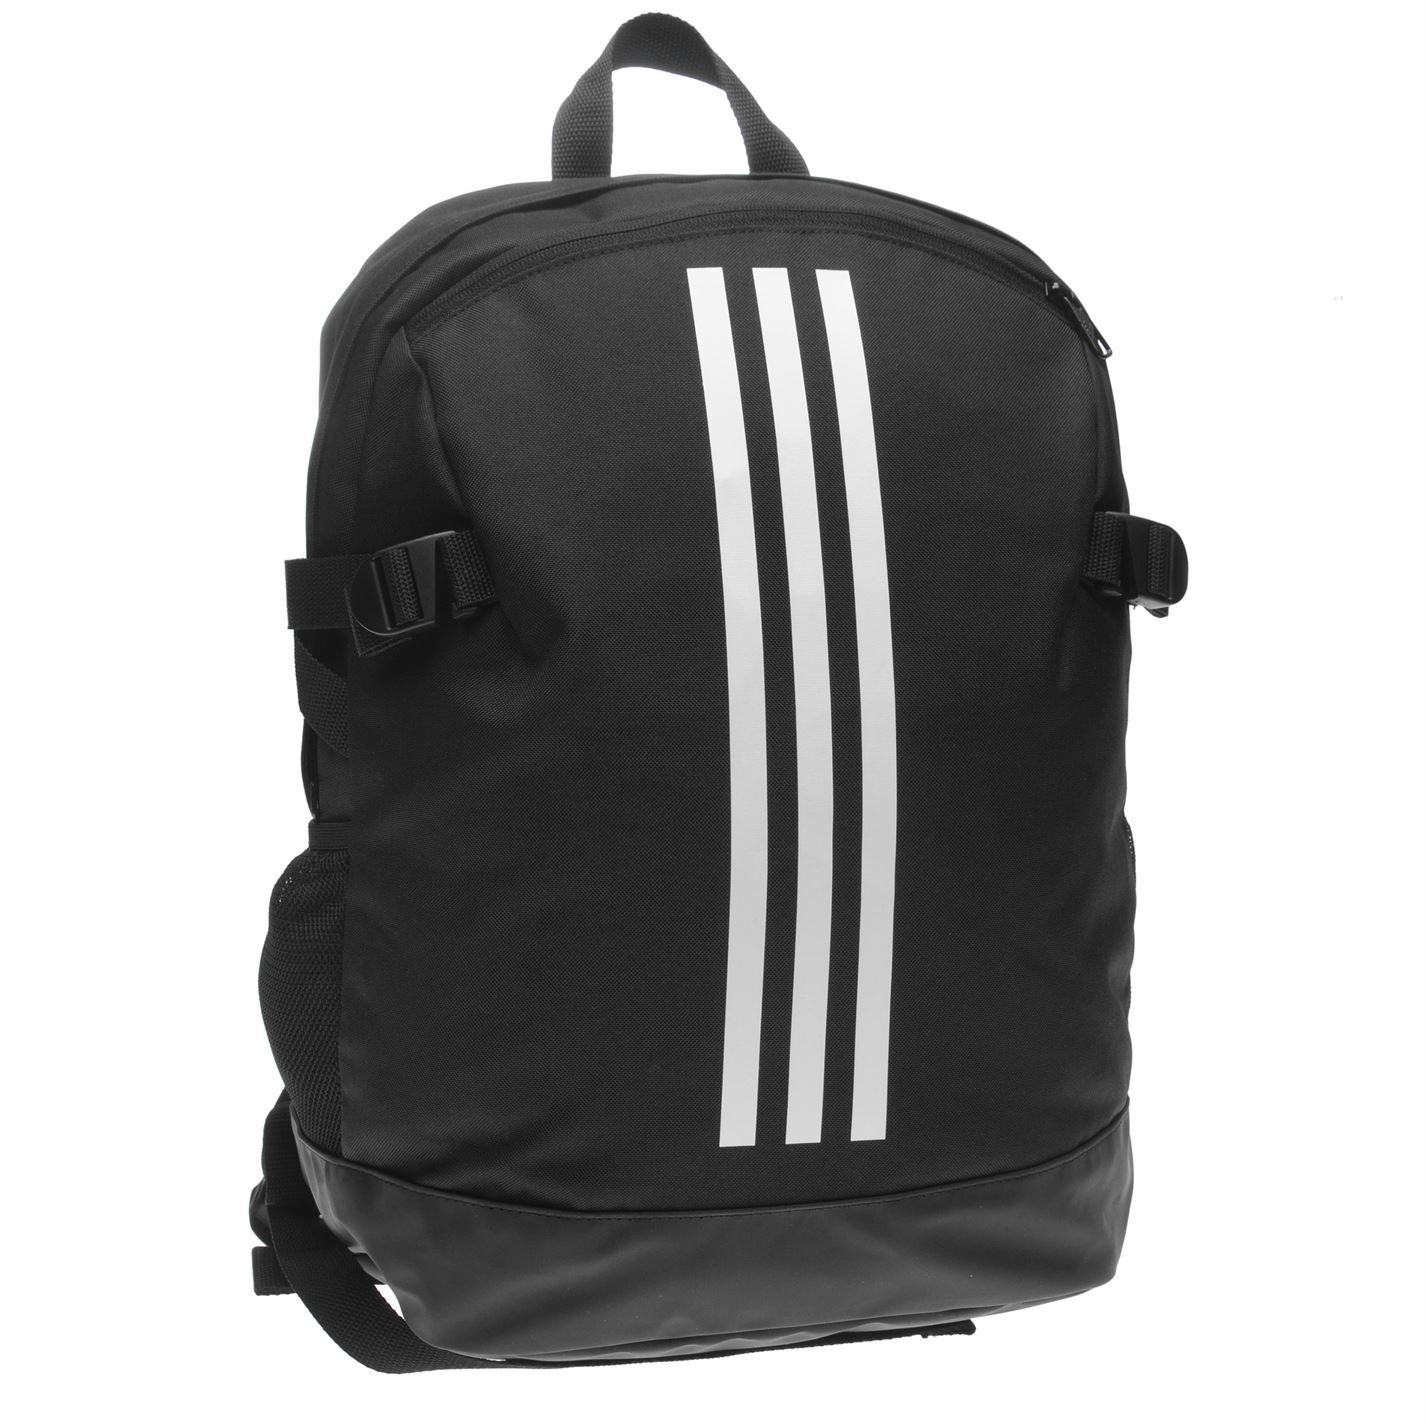 4f1aad1062 adidas Power 4 Backpack Black White Sports Bag Holdall Rucksack